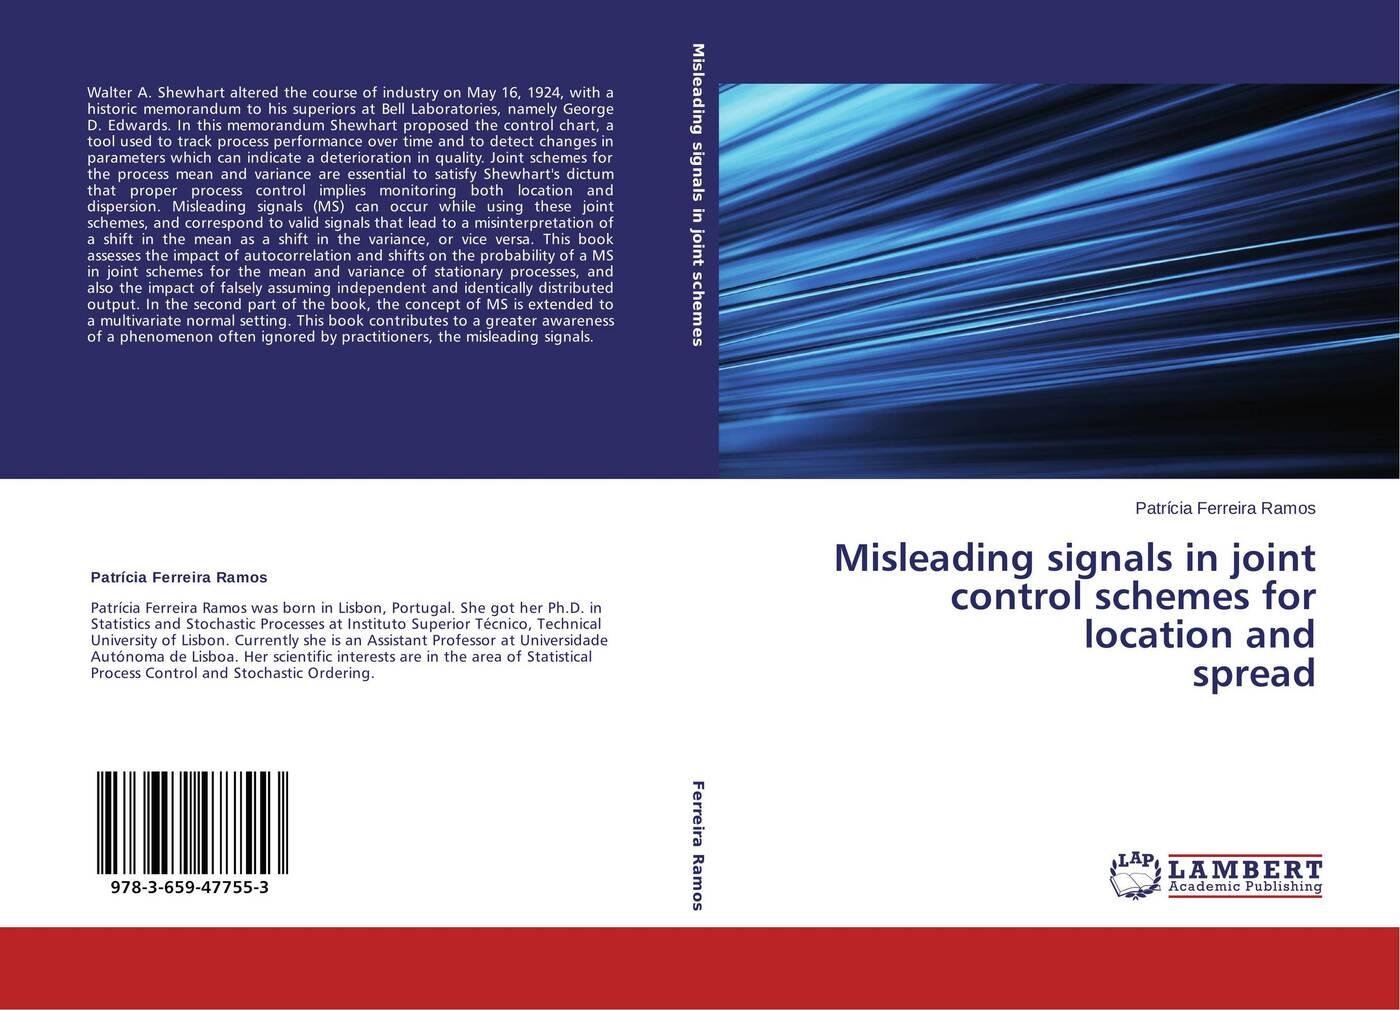 лучшая цена Patrícia Ferreira Ramos Misleading signals in joint control schemes for location and spread